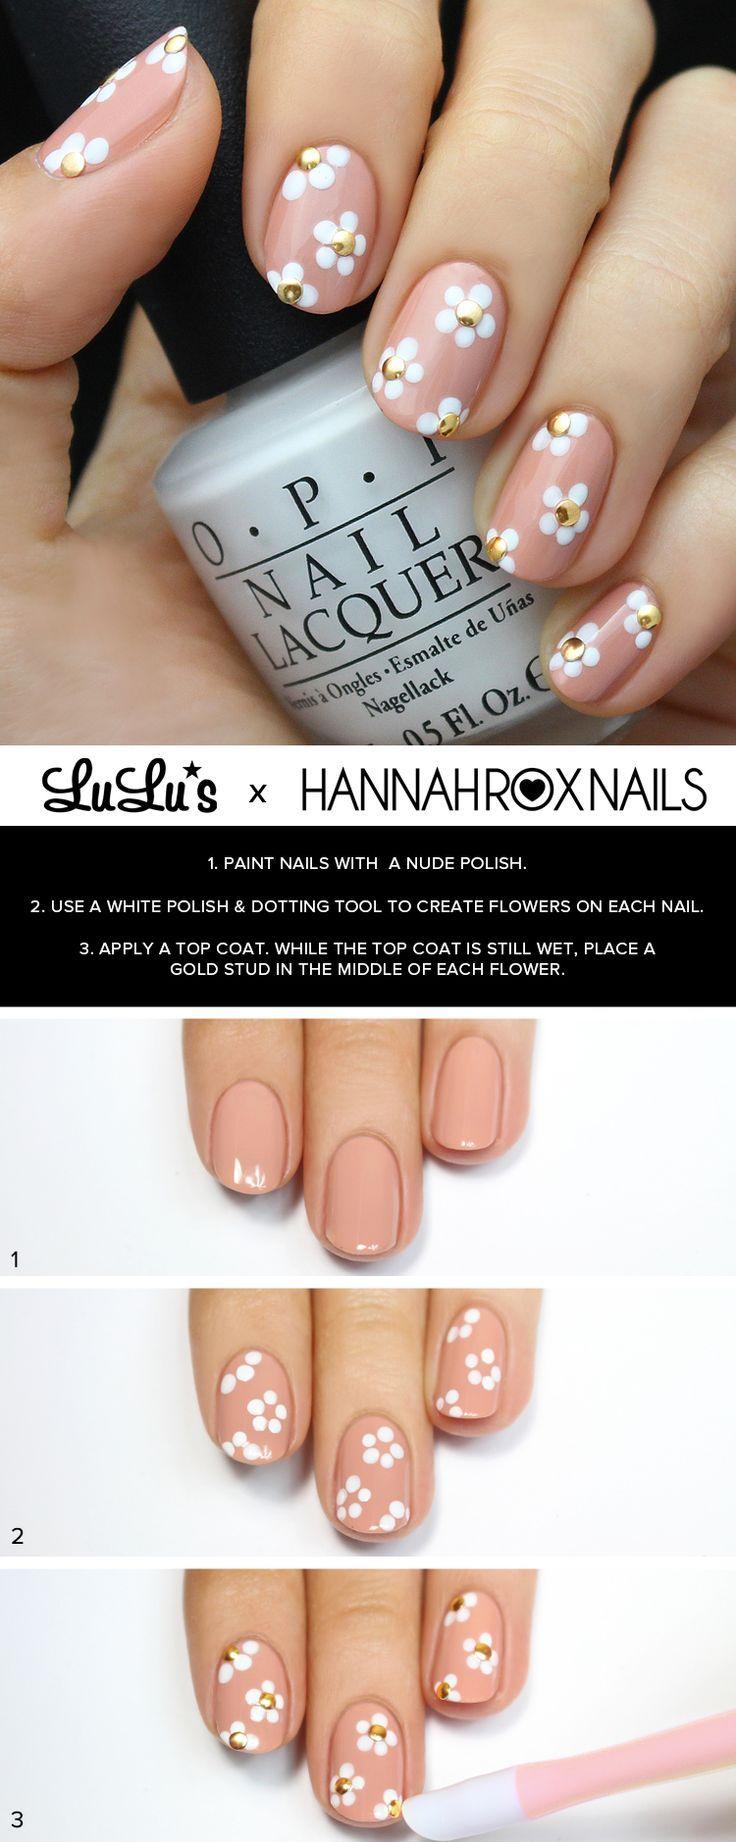 25 Simple Nail Art Tutorials For Beginners #nailart